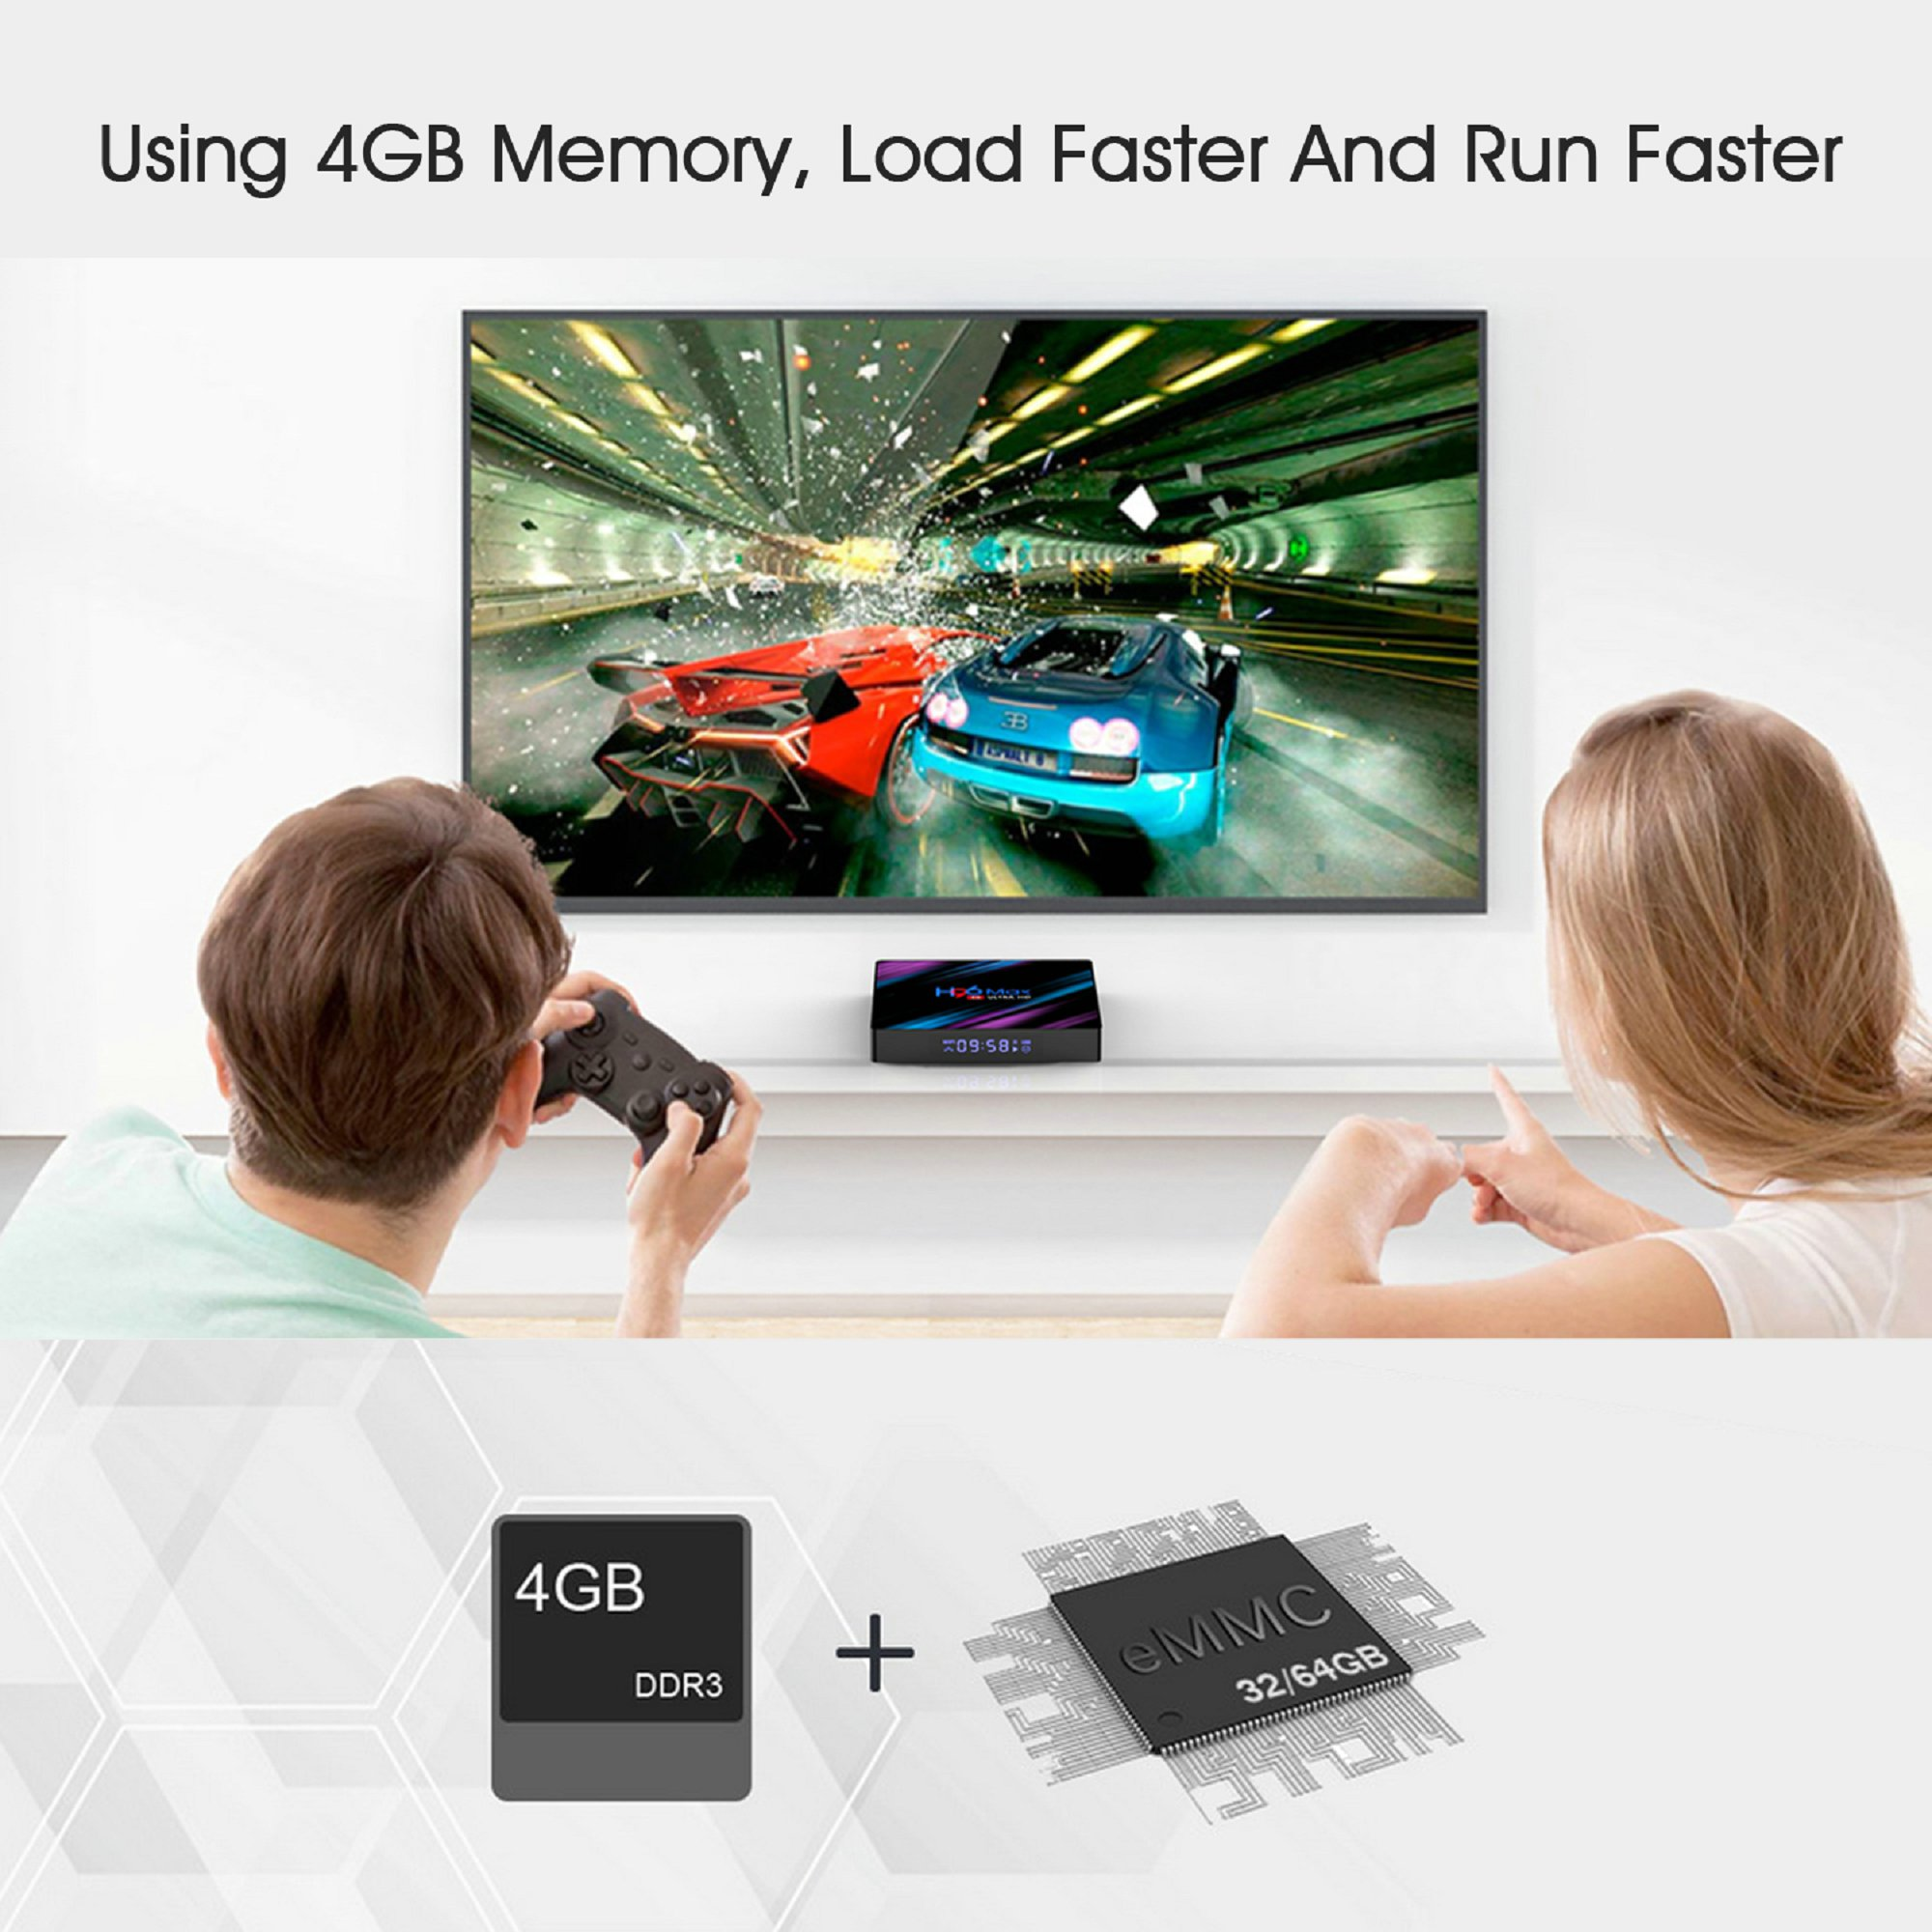 LEMFO H96 Max Smart Android TV Box 9.0 RK3318 4GB 32GB 64GB 4K HDR 2.4G&5G Wifi BT4.0 USB 3.0 Netflix Goole Play Set Top Box